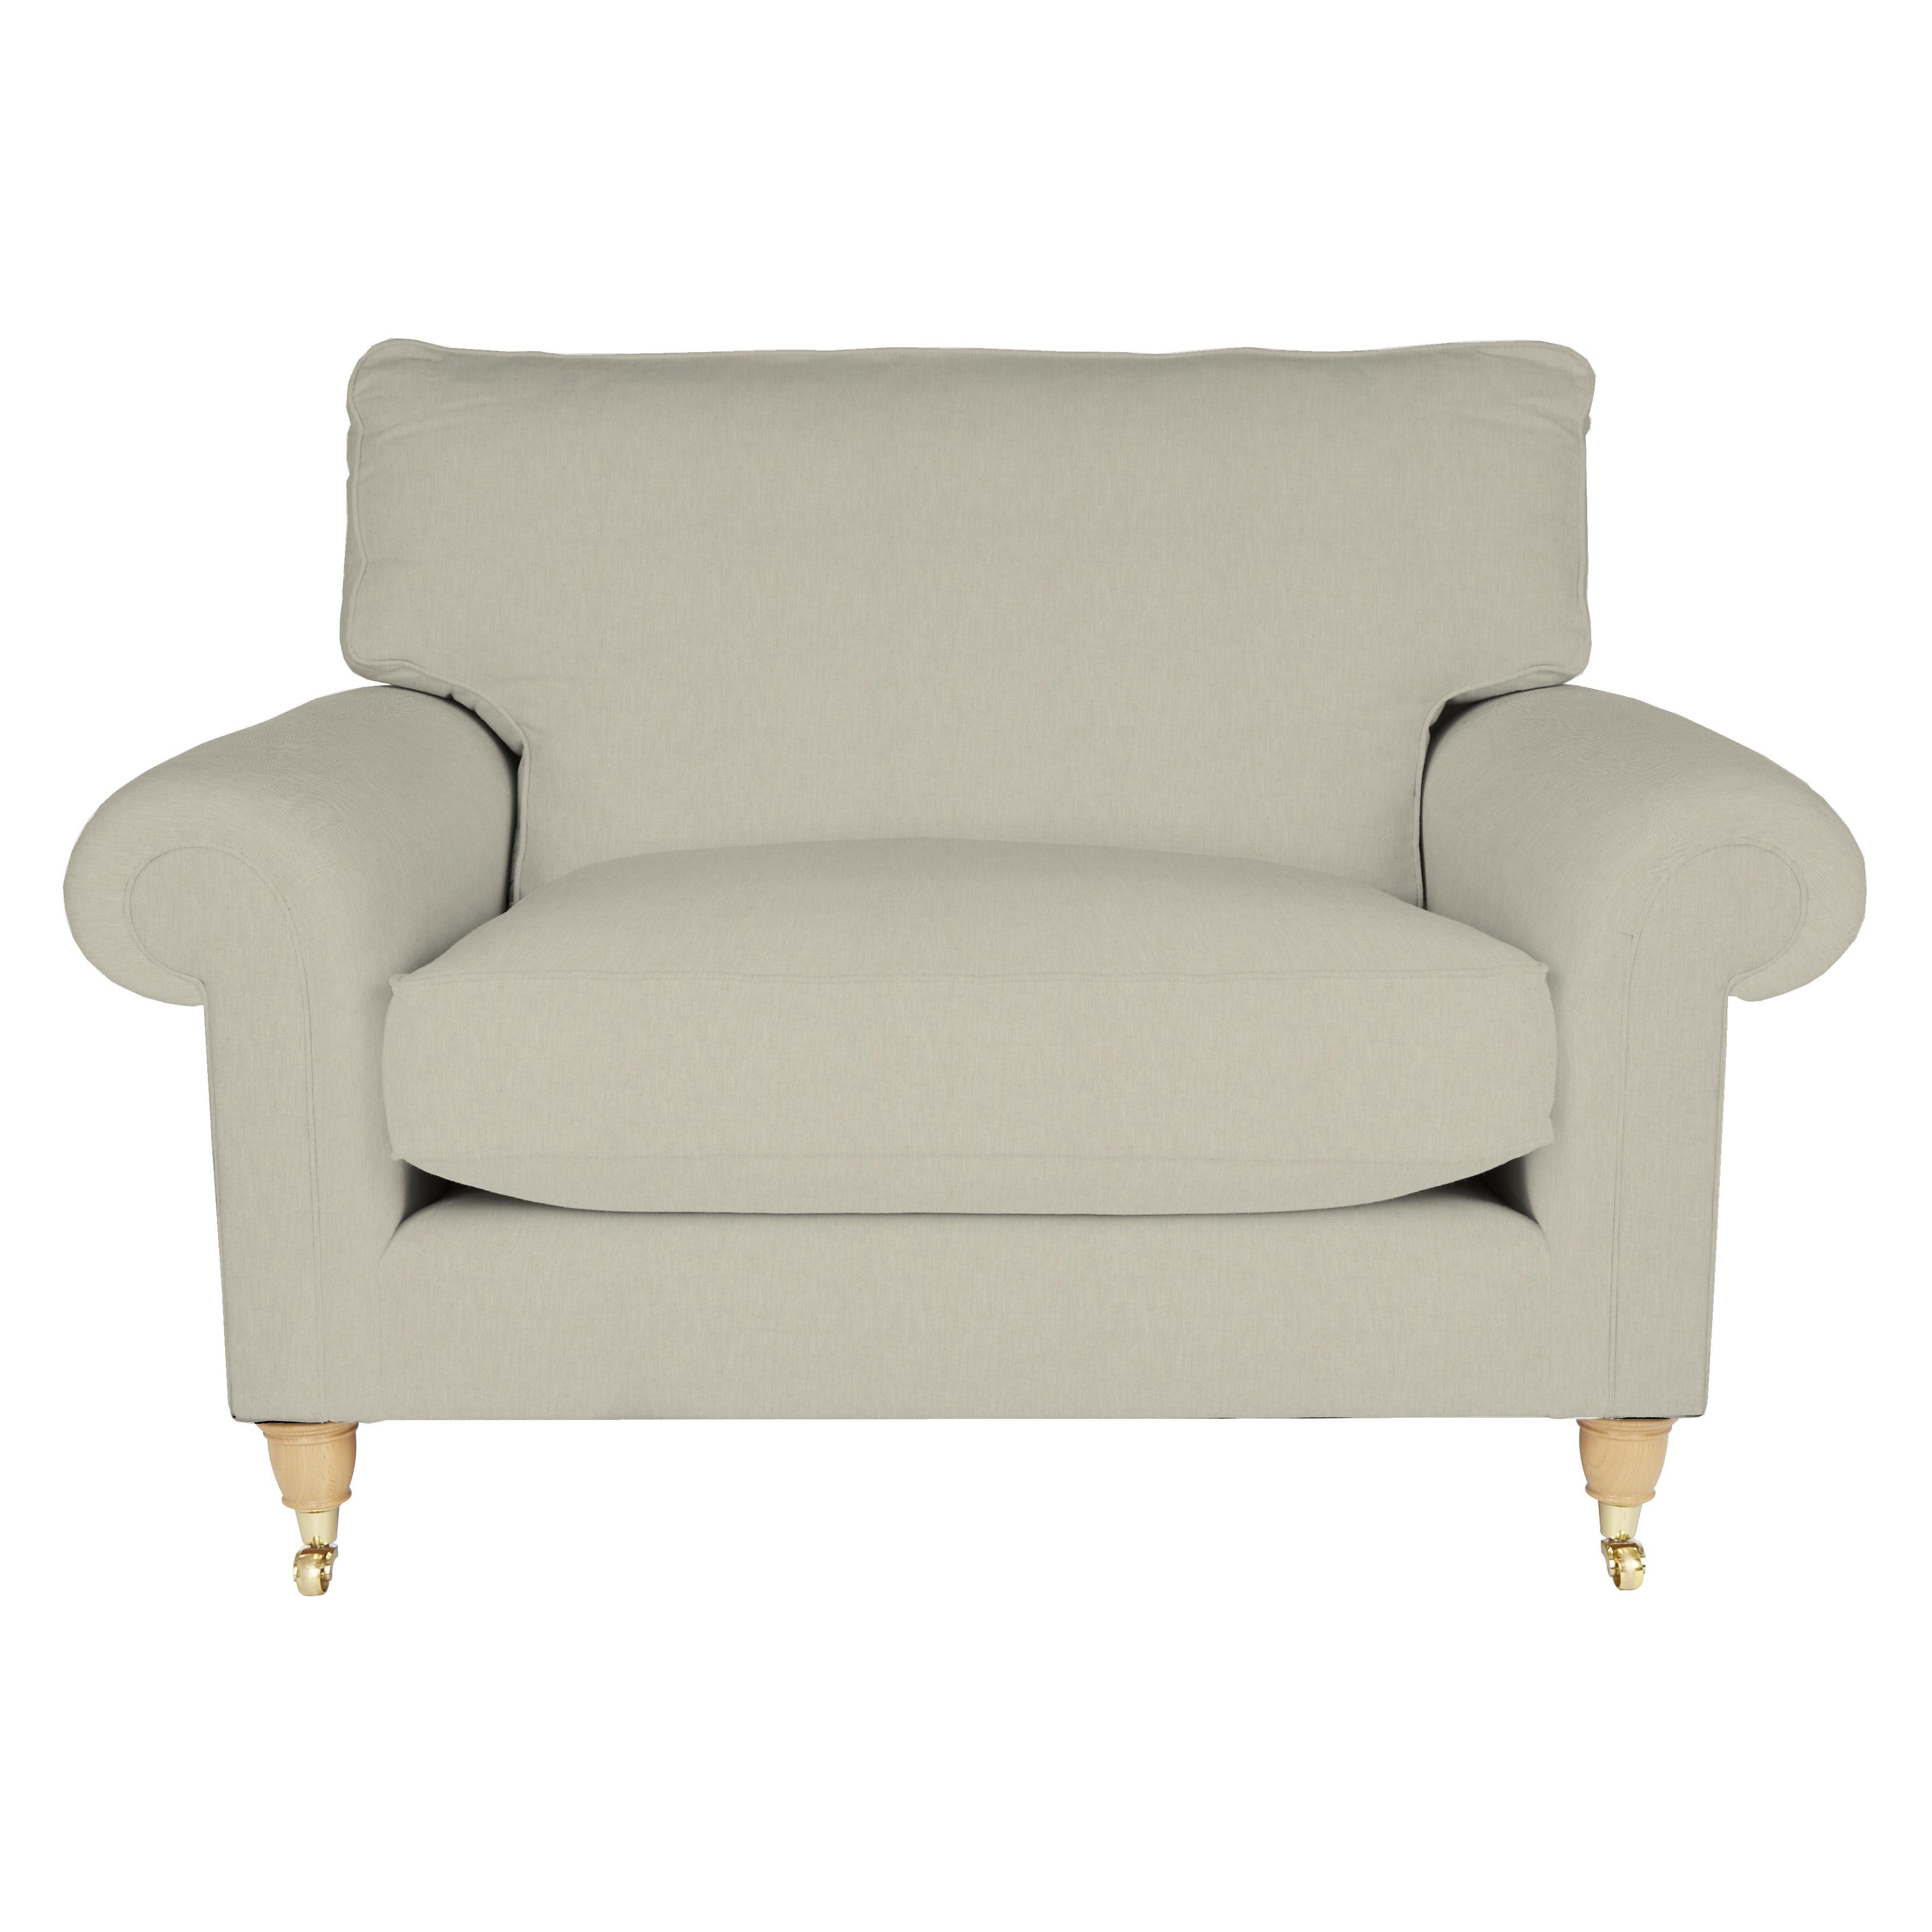 chair covers kingston eno hammock fixed snuggler mysmallspace